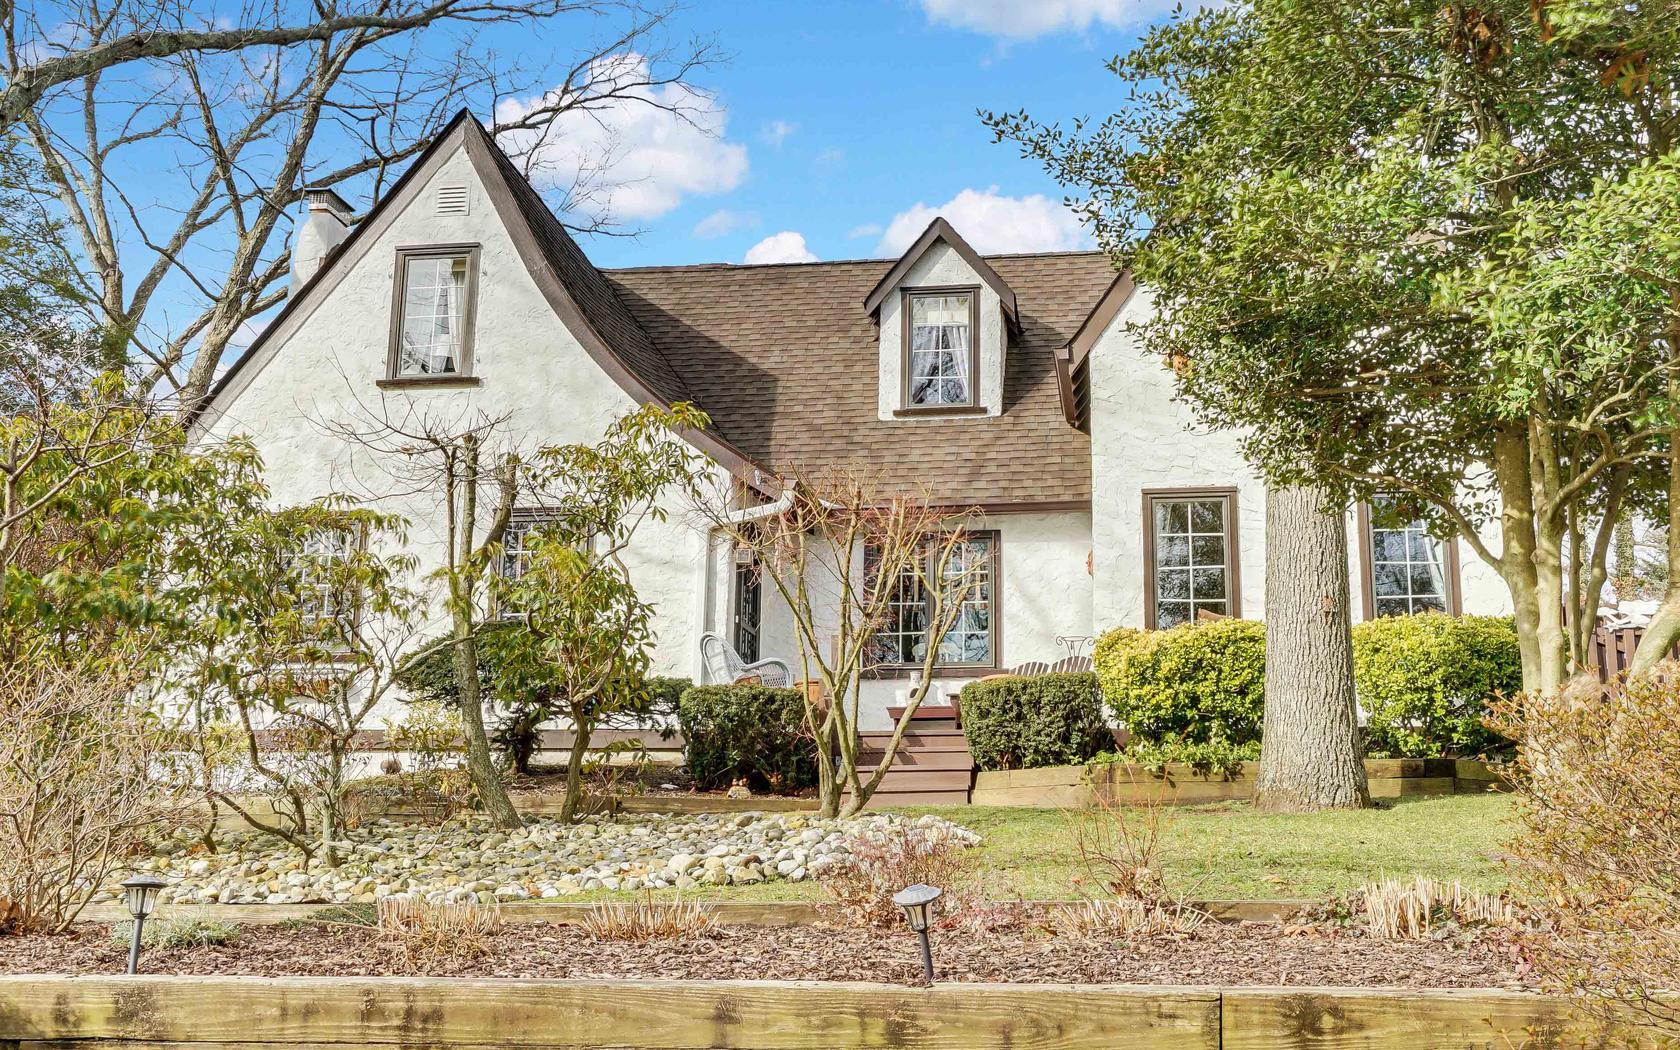 独户住宅 为 销售 在 Tudoor 2559 Algonkin Trail Manasquan, 新泽西州, 08736 美国